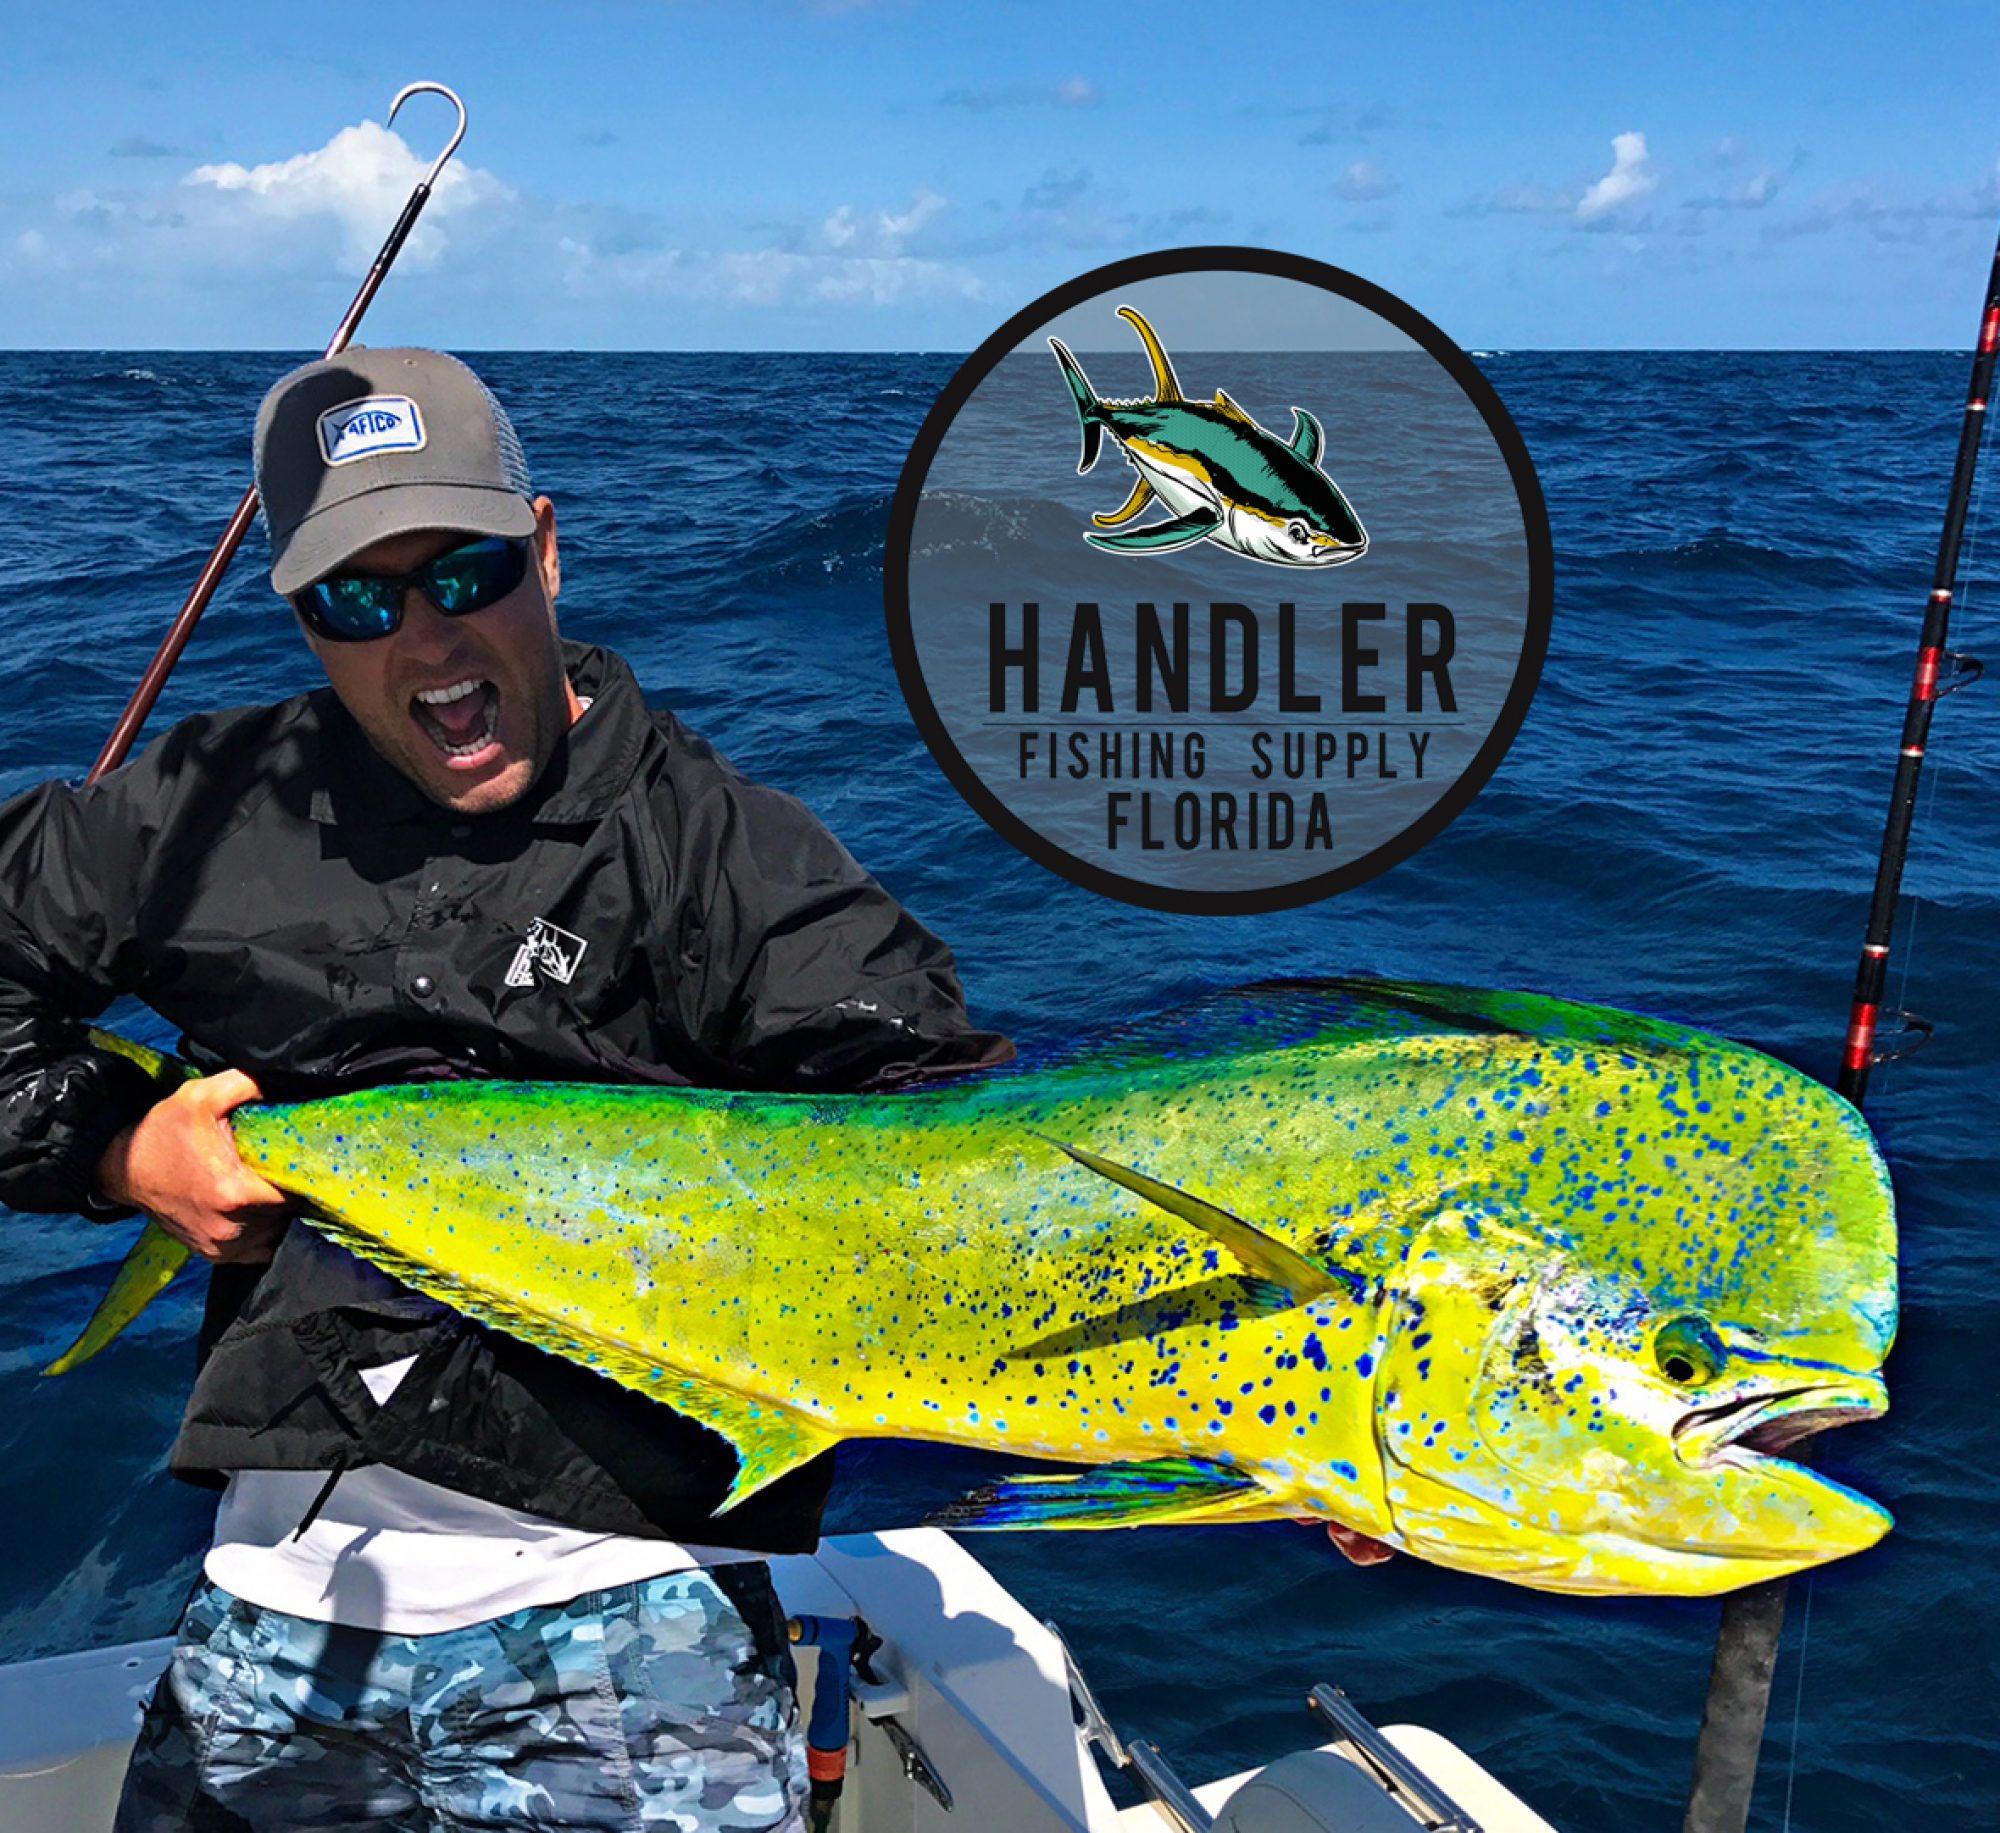 Handler Fishing Supply in Merritt Island, Florida